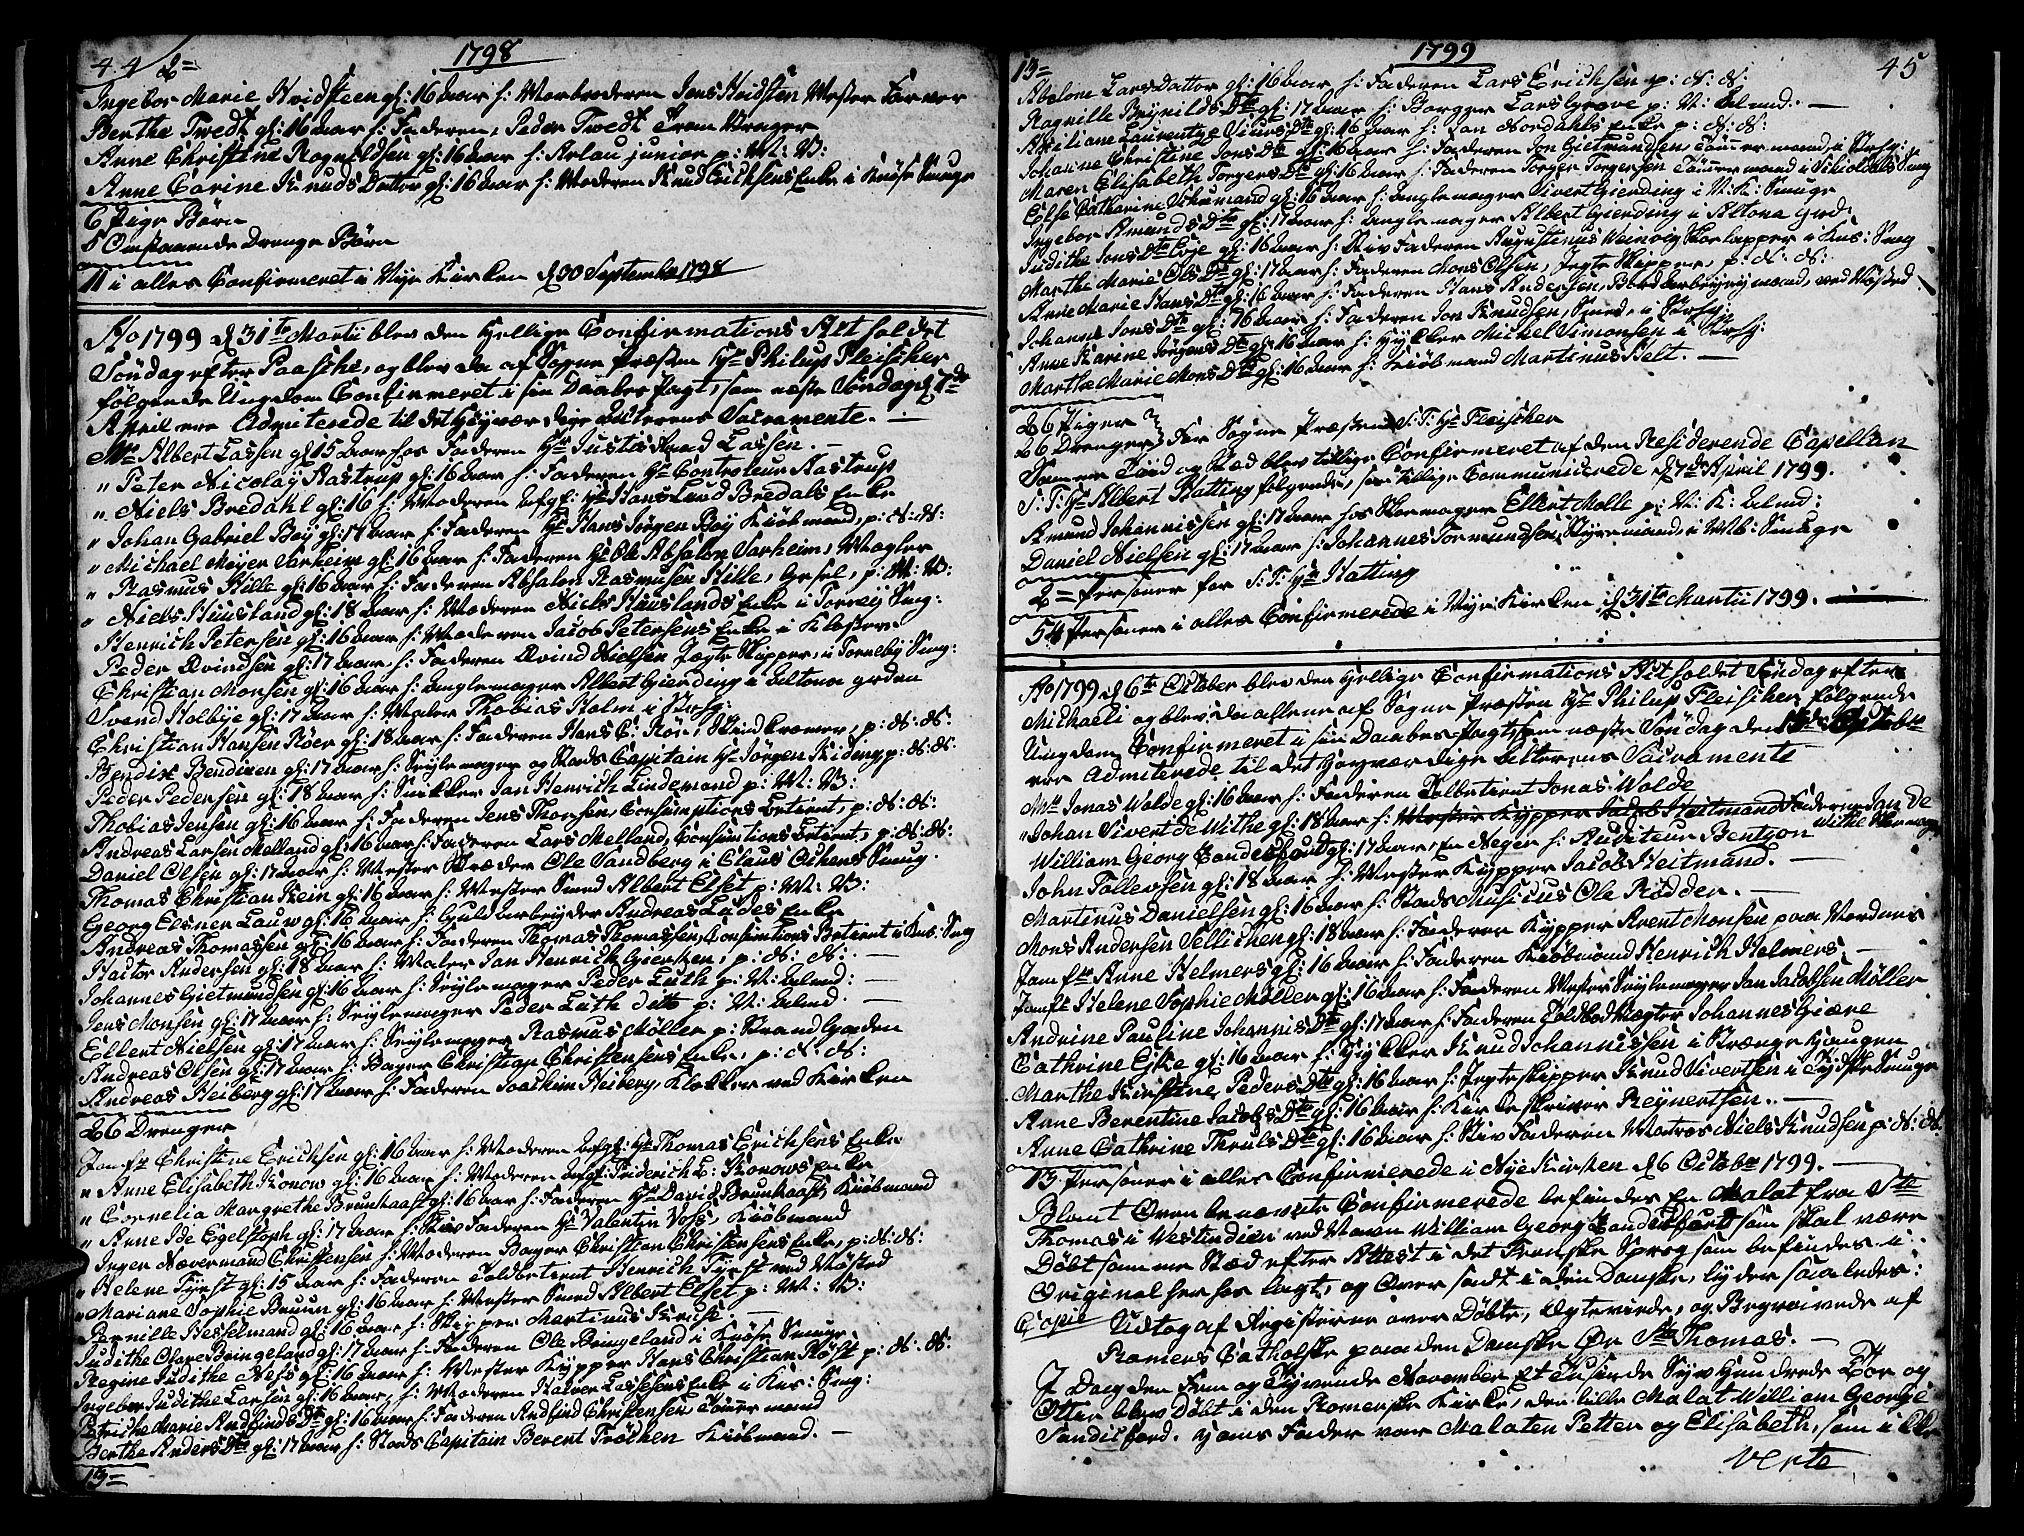 SAB, Nykirken Sokneprestembete, H/Hab: Klokkerbok nr. A 1, 1770-1821, s. 44-45